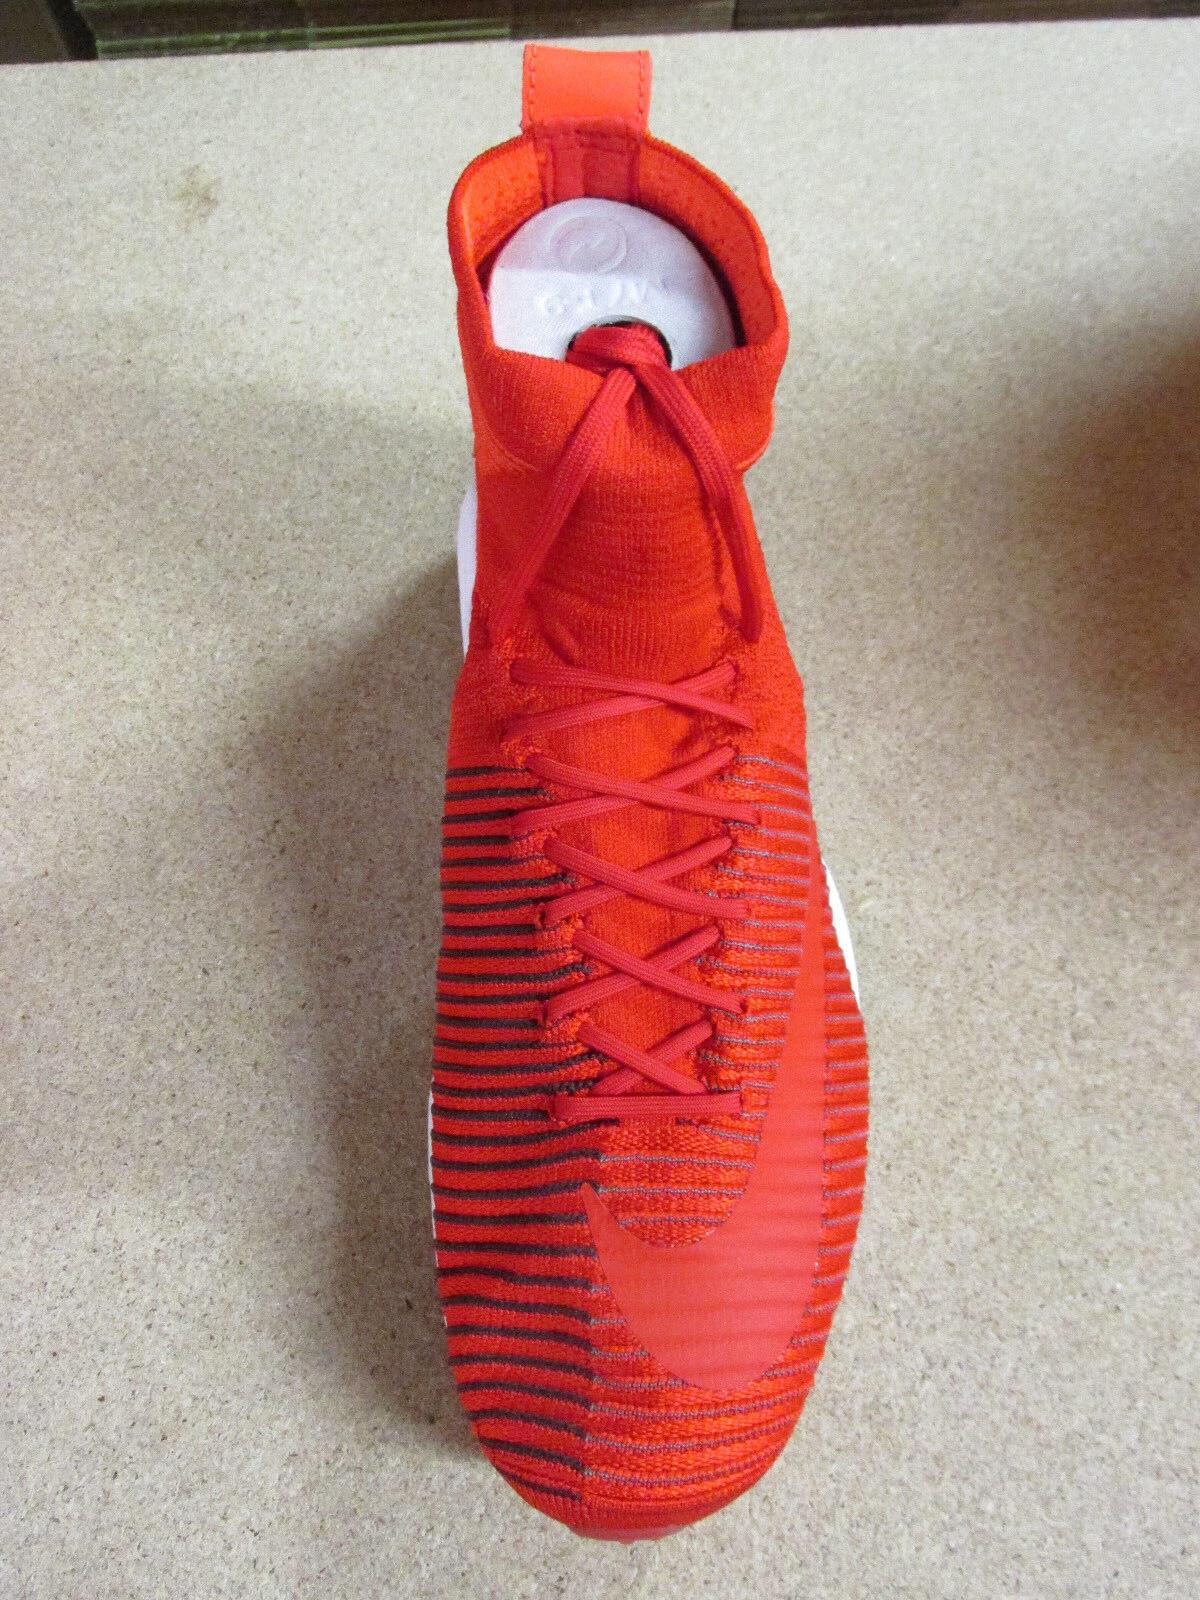 Nike Zoom Mercurial Xi FK Scarpe da da da Ginnastica Alla Caviglia Uomo 844626 600 | La qualità prima  61383c